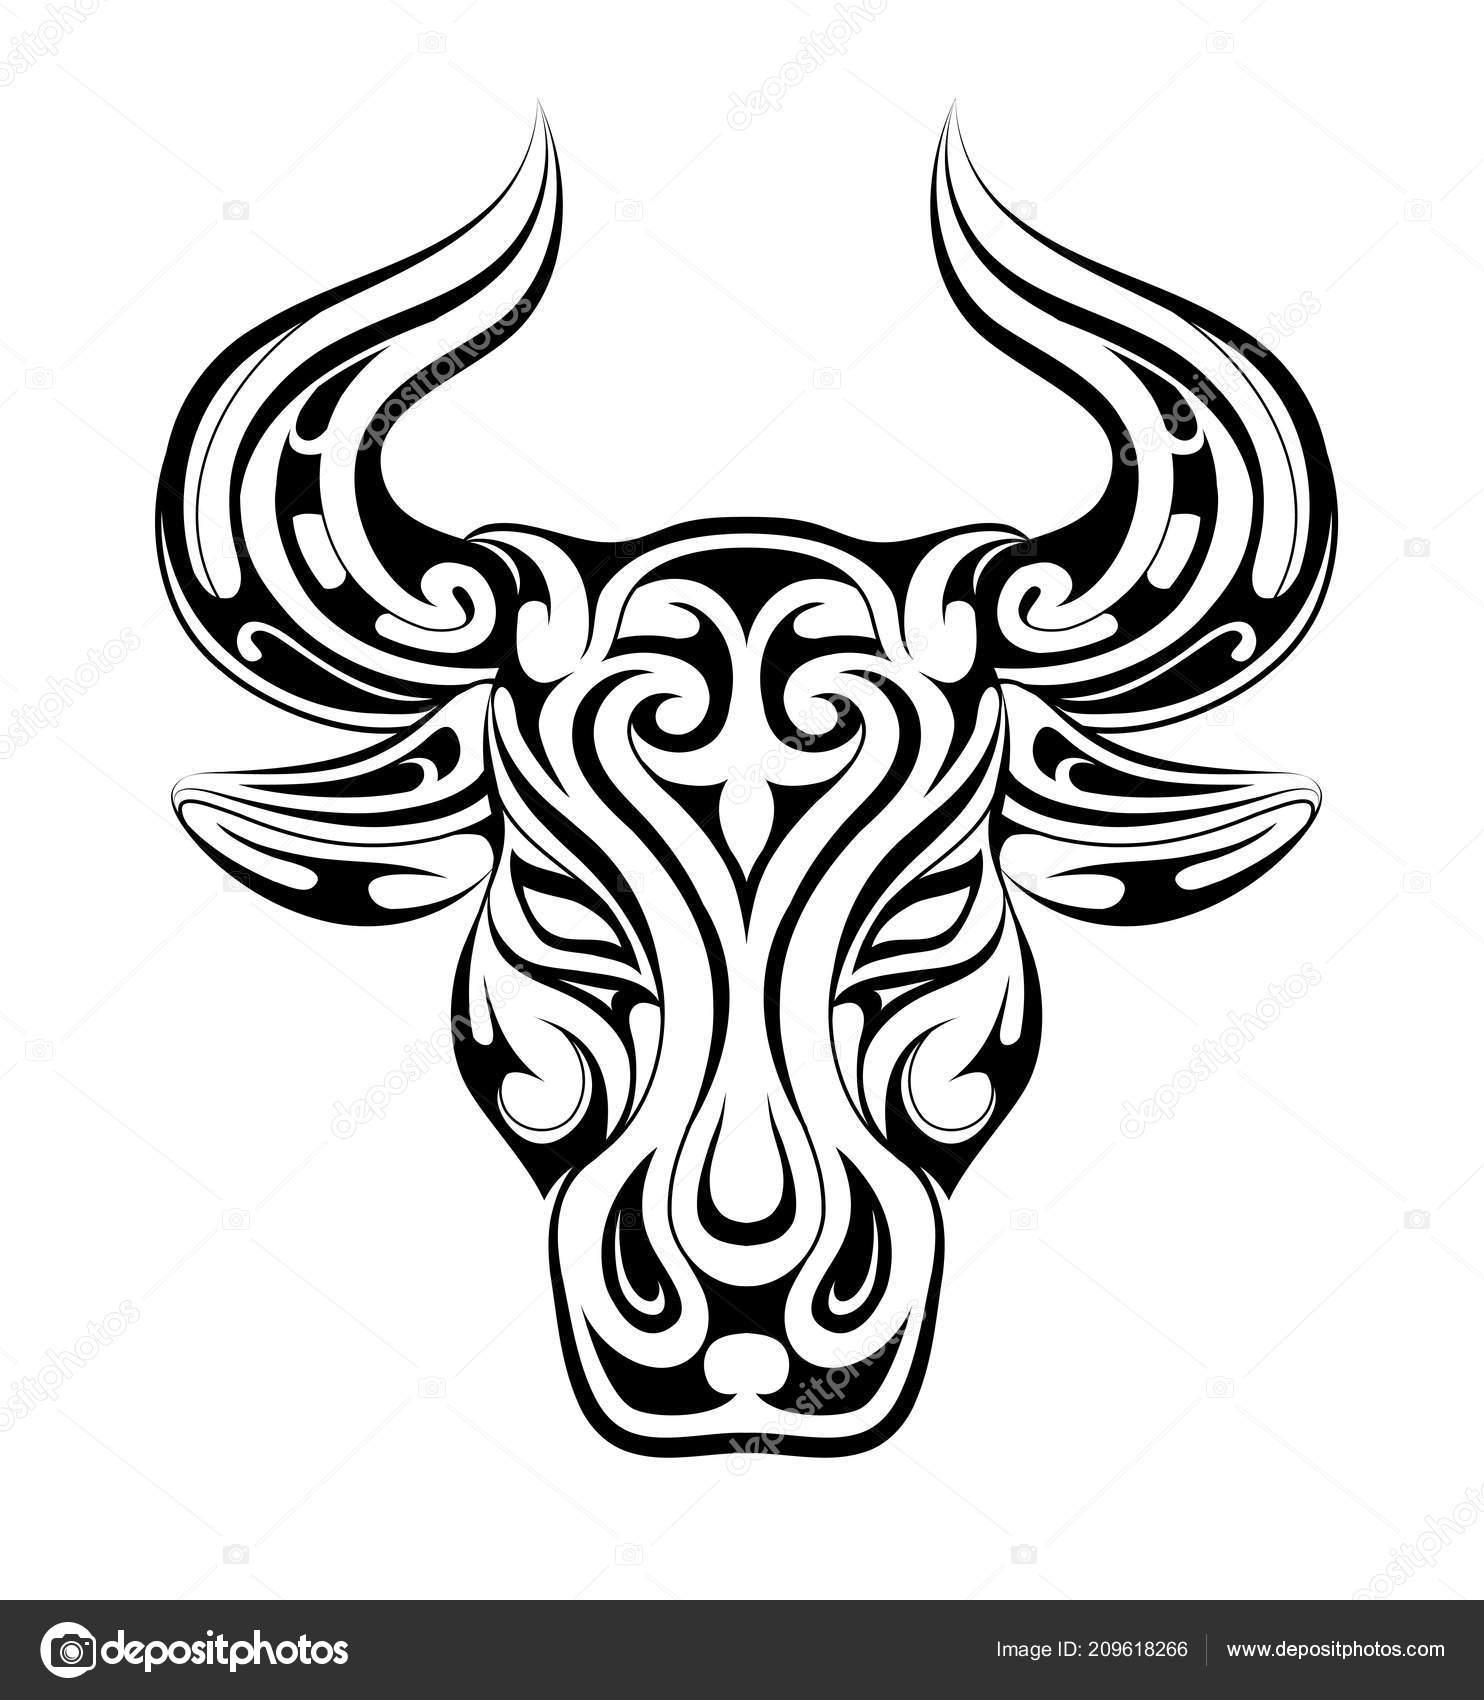 Tatuaje De Tauro Como Símbolo Del Zodiaco Vector De Stock Akvlv